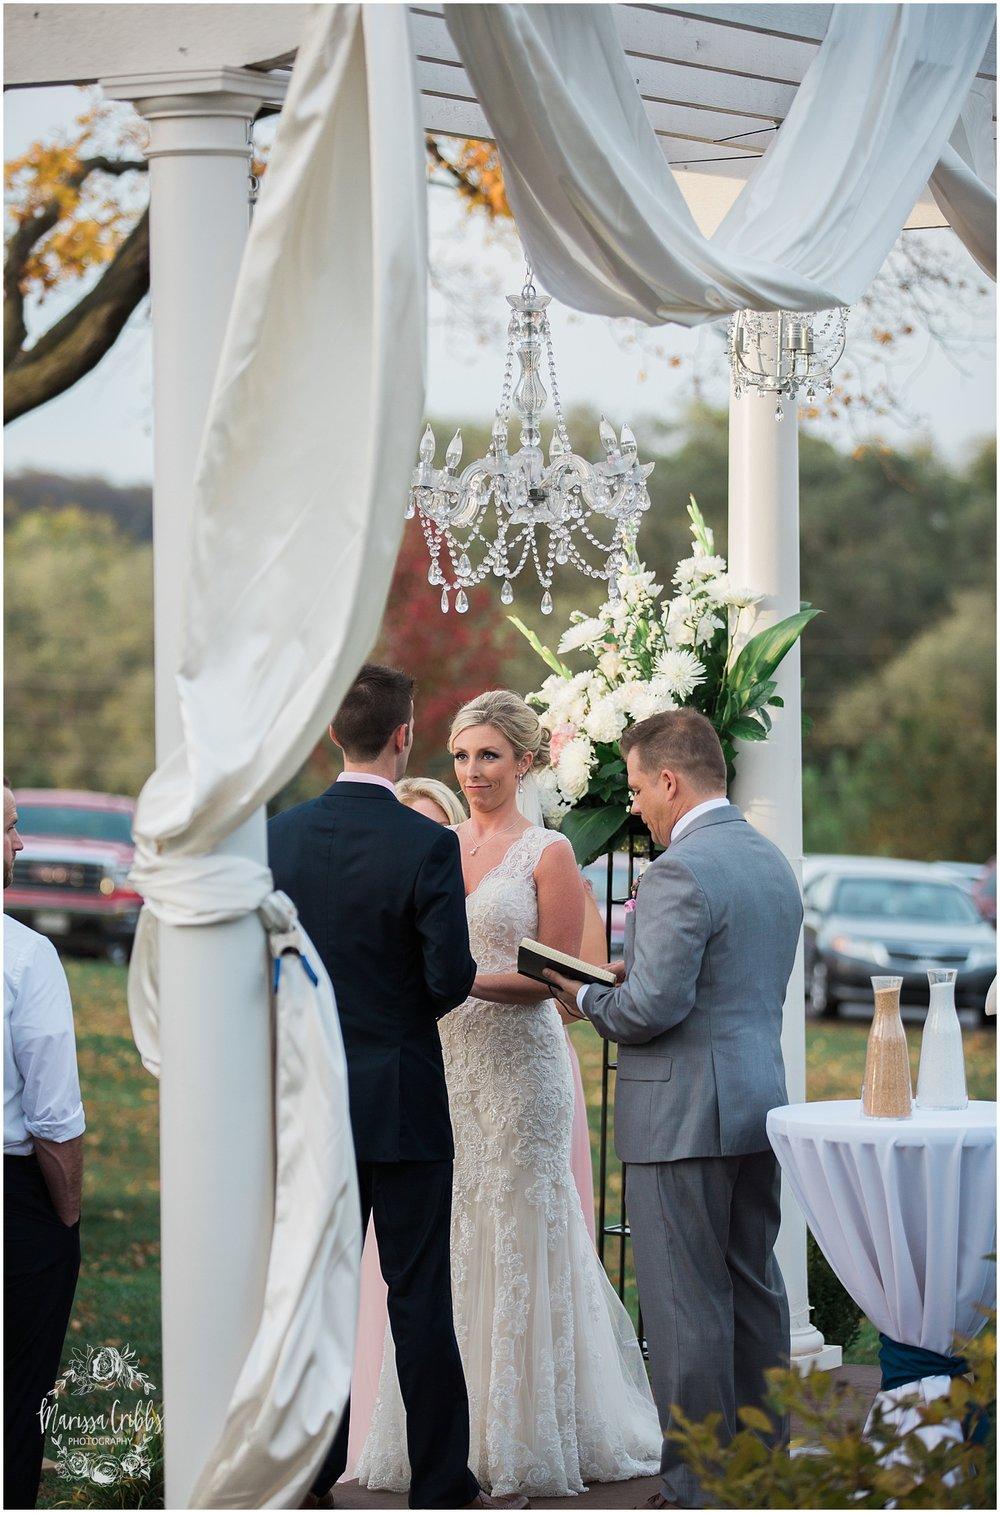 Alex & Amie | Eighteen Ninety Event Space | Marissa Cribbs Photography | Kansas City Perfect Wedding Guide_1342.jpg